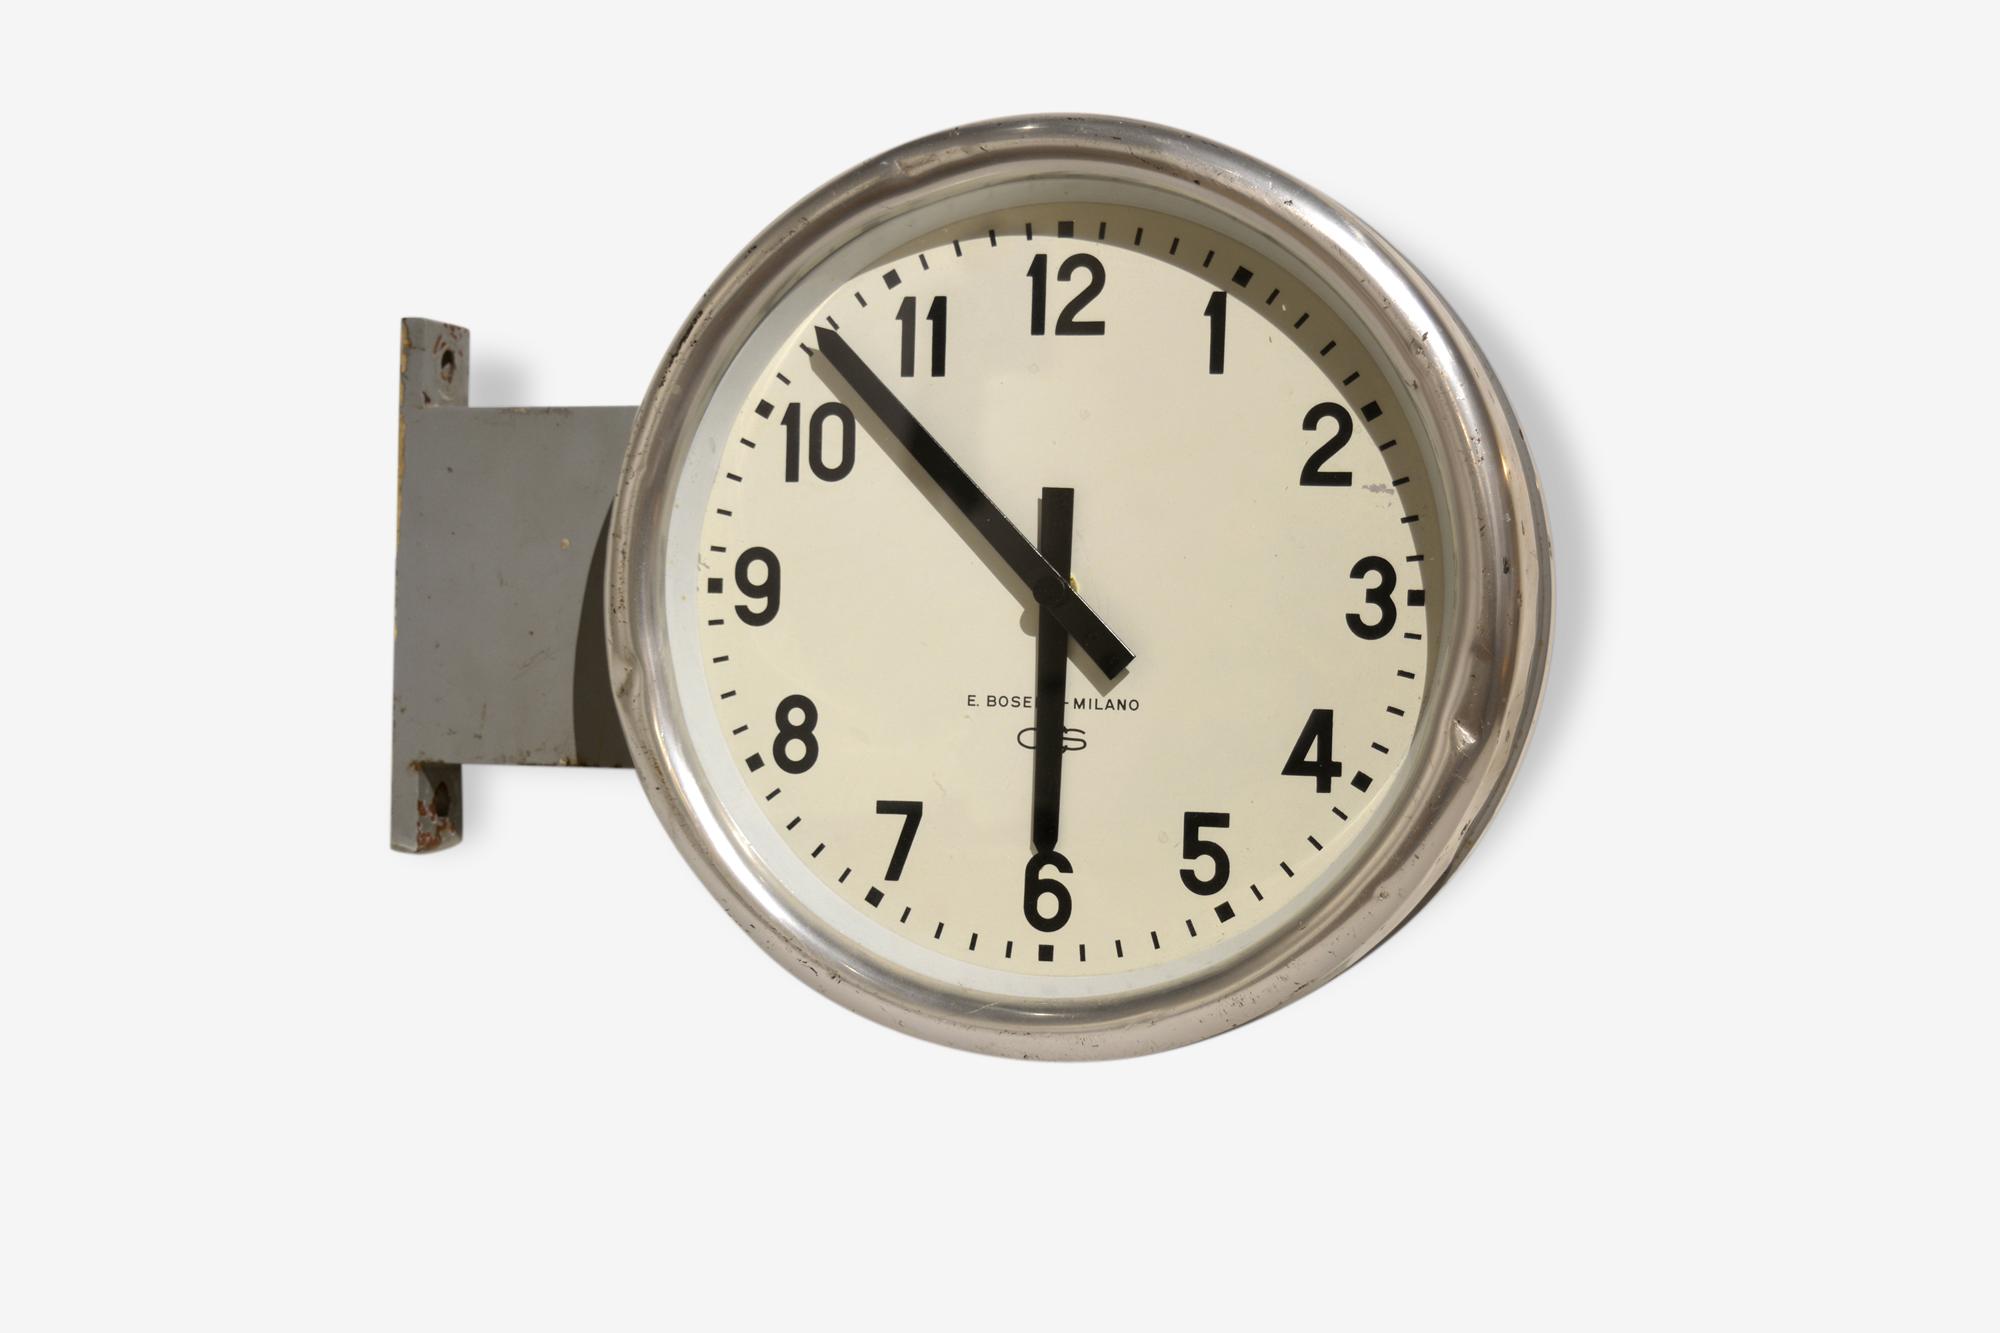 Horloge Double face, design par Gio Ponti pour Boselli Milano, 1936